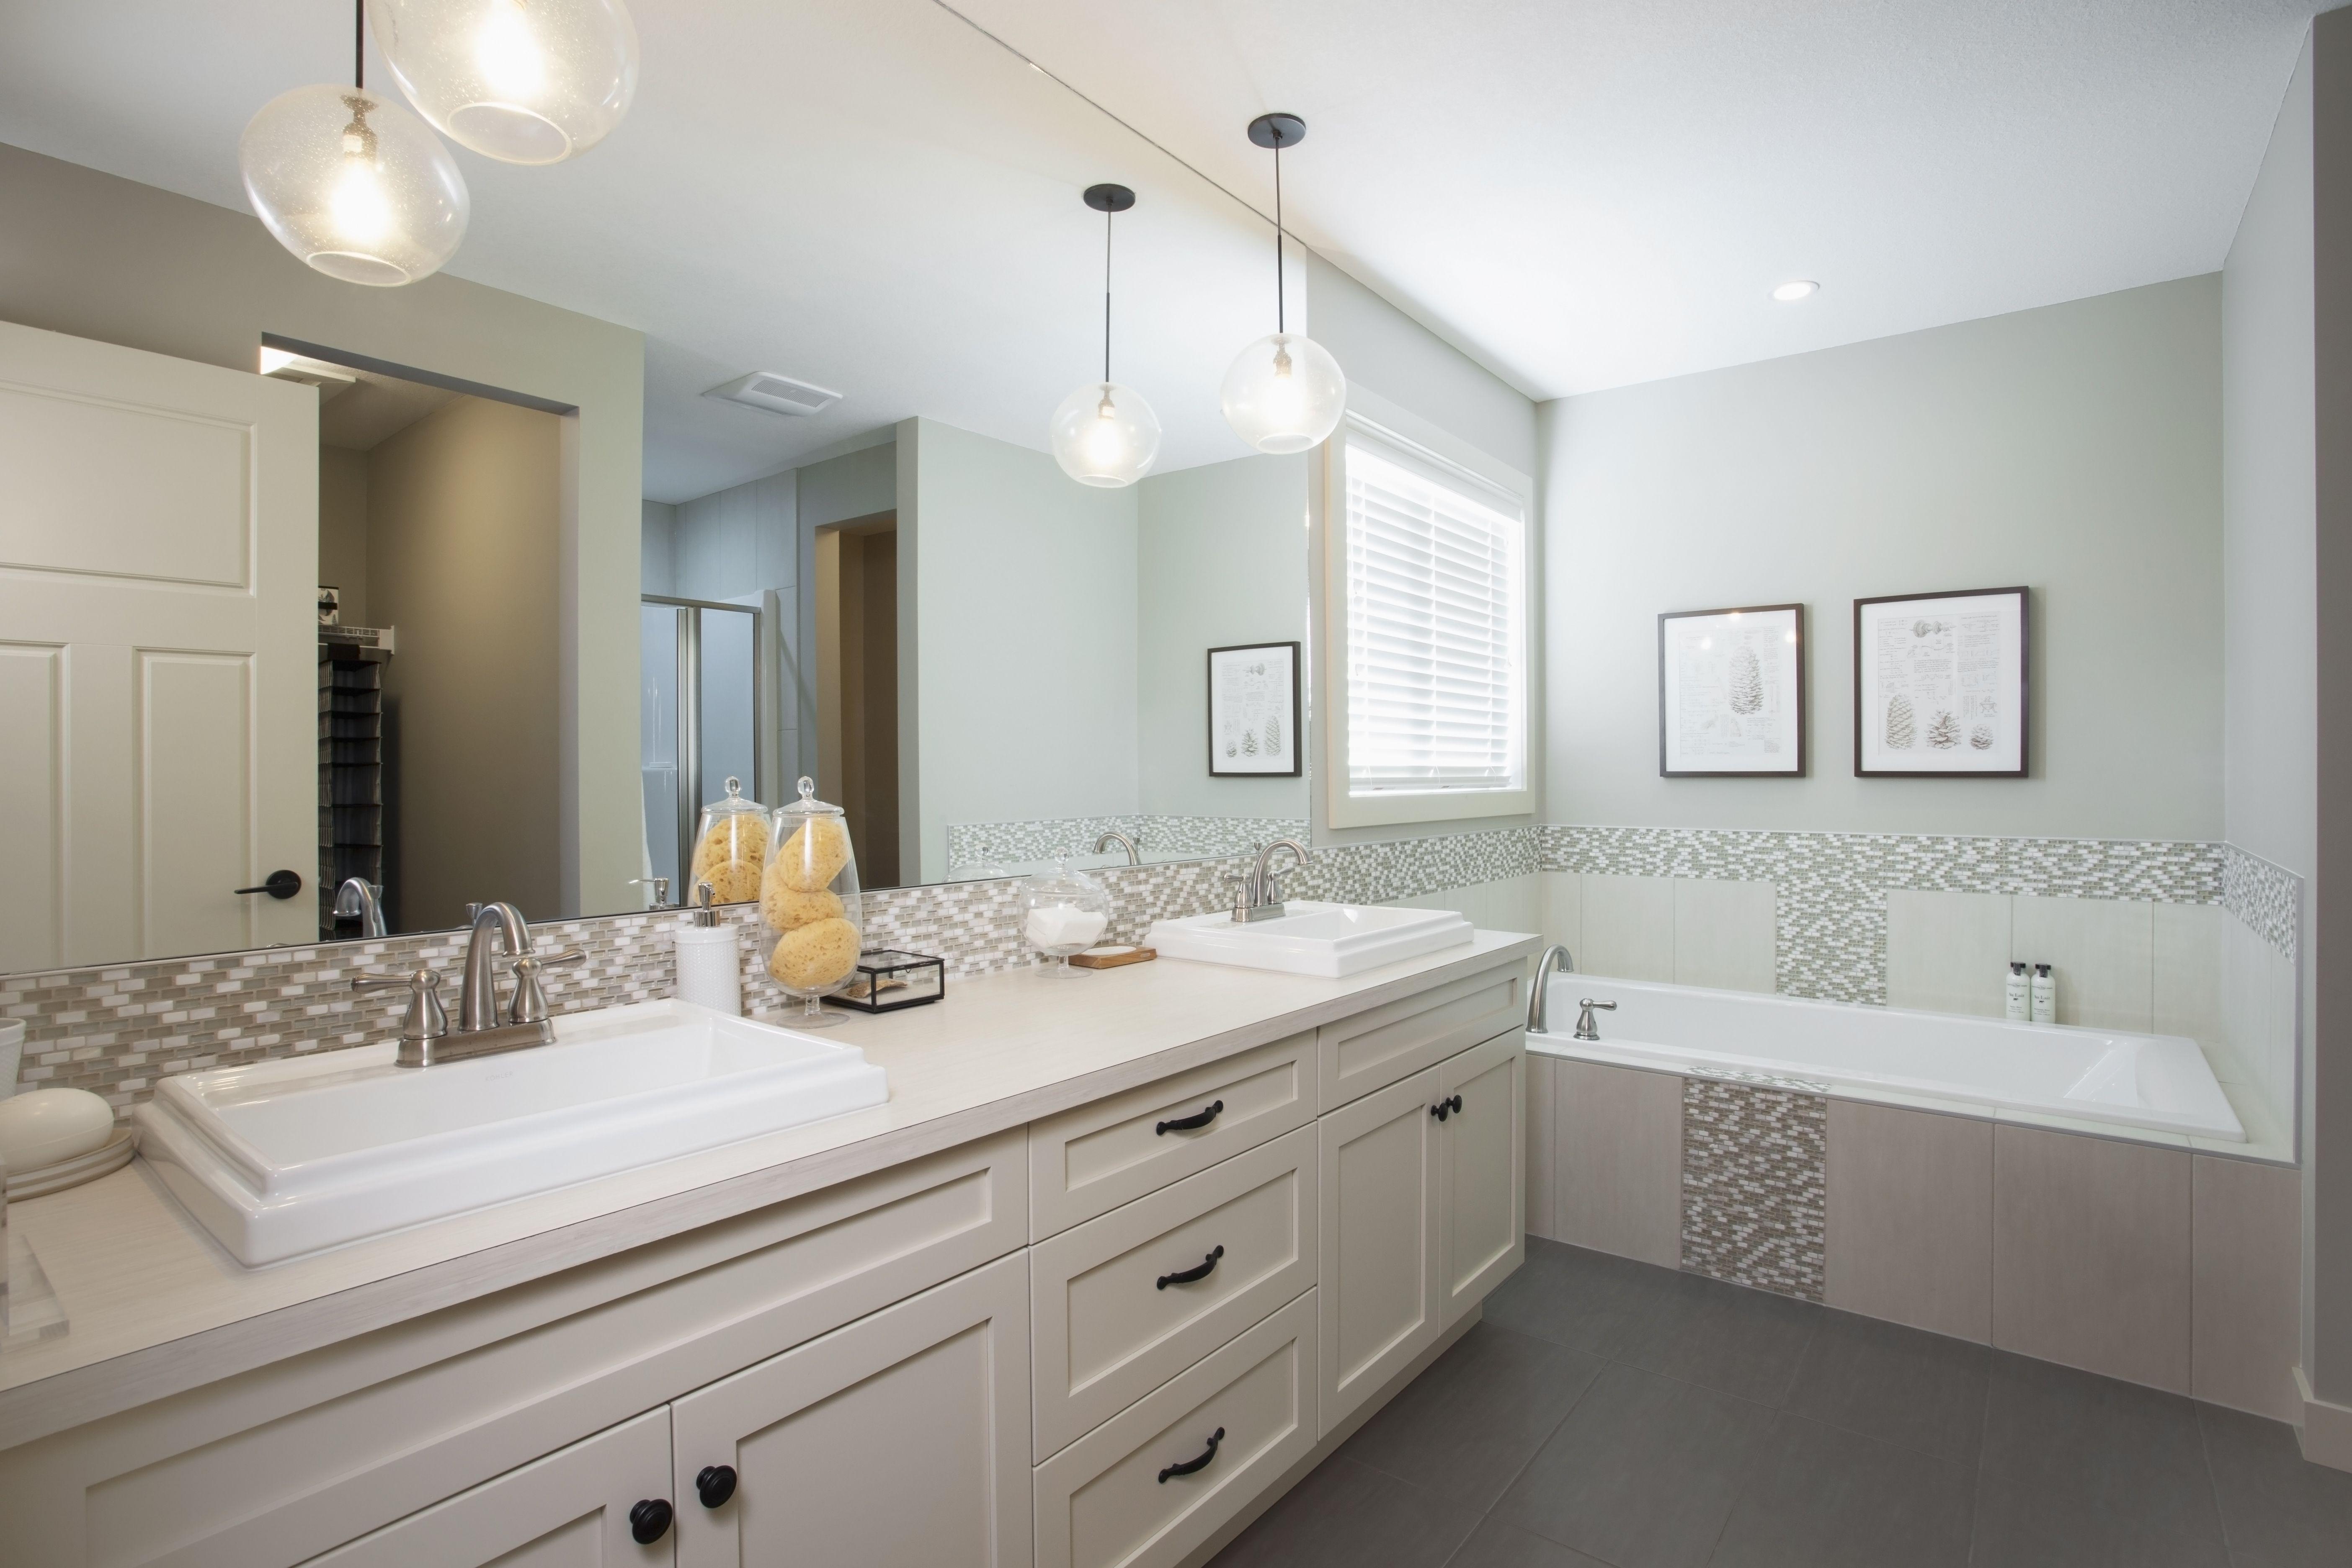 Bathroom Pendant Lights In Front Of Builder Mirror Backsplash Tile Alllll Over Bathroom Pendant Bathroom Pendant Lighting New Bathroom Designs